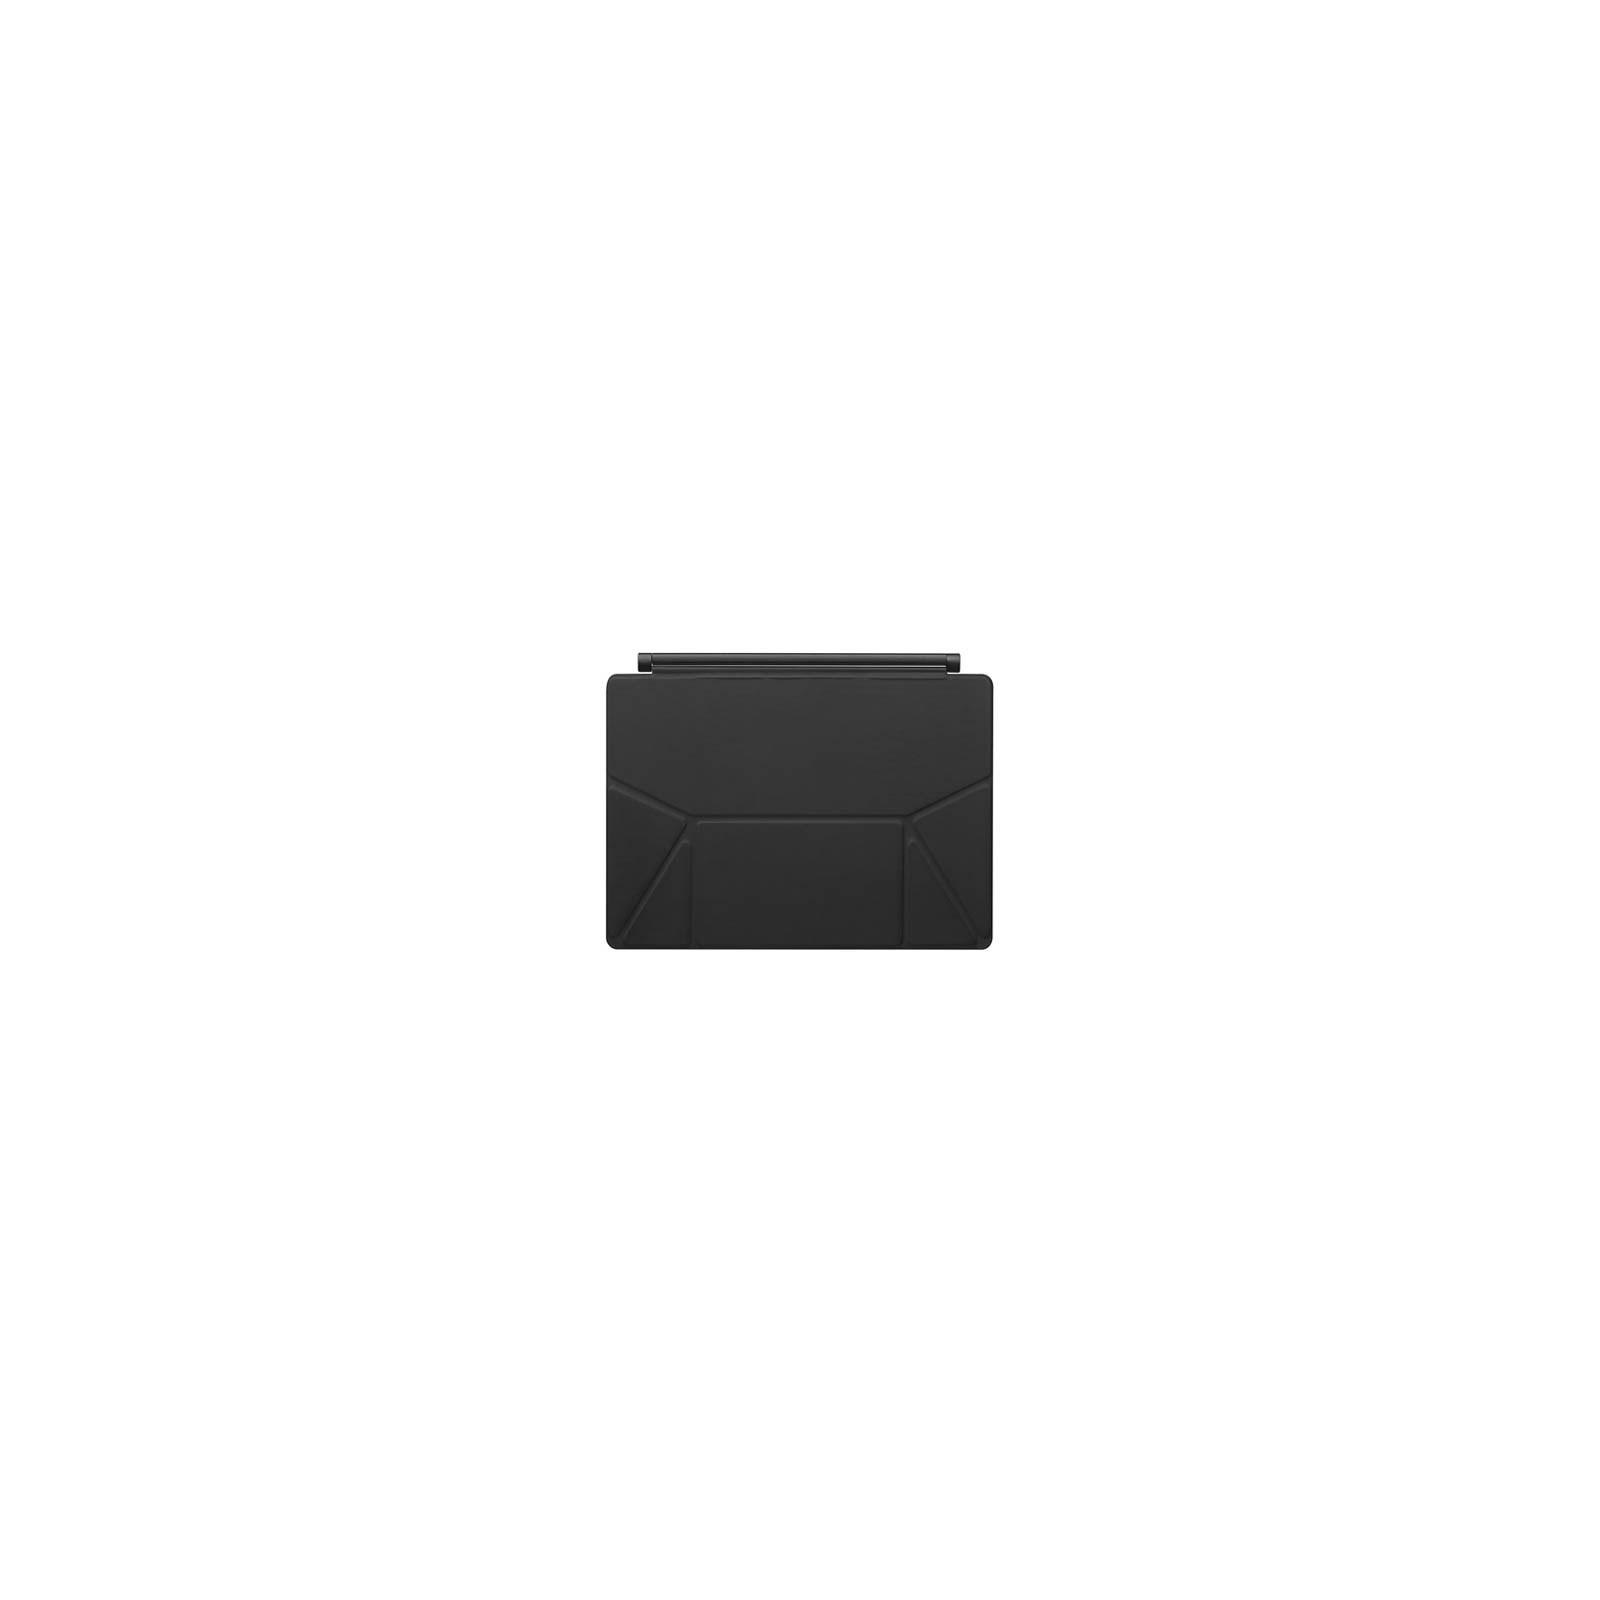 Чехол для планшета ASUS 10.1 ME400 TranSleeve Vivo BLACK (90XB00GP-BSL000)